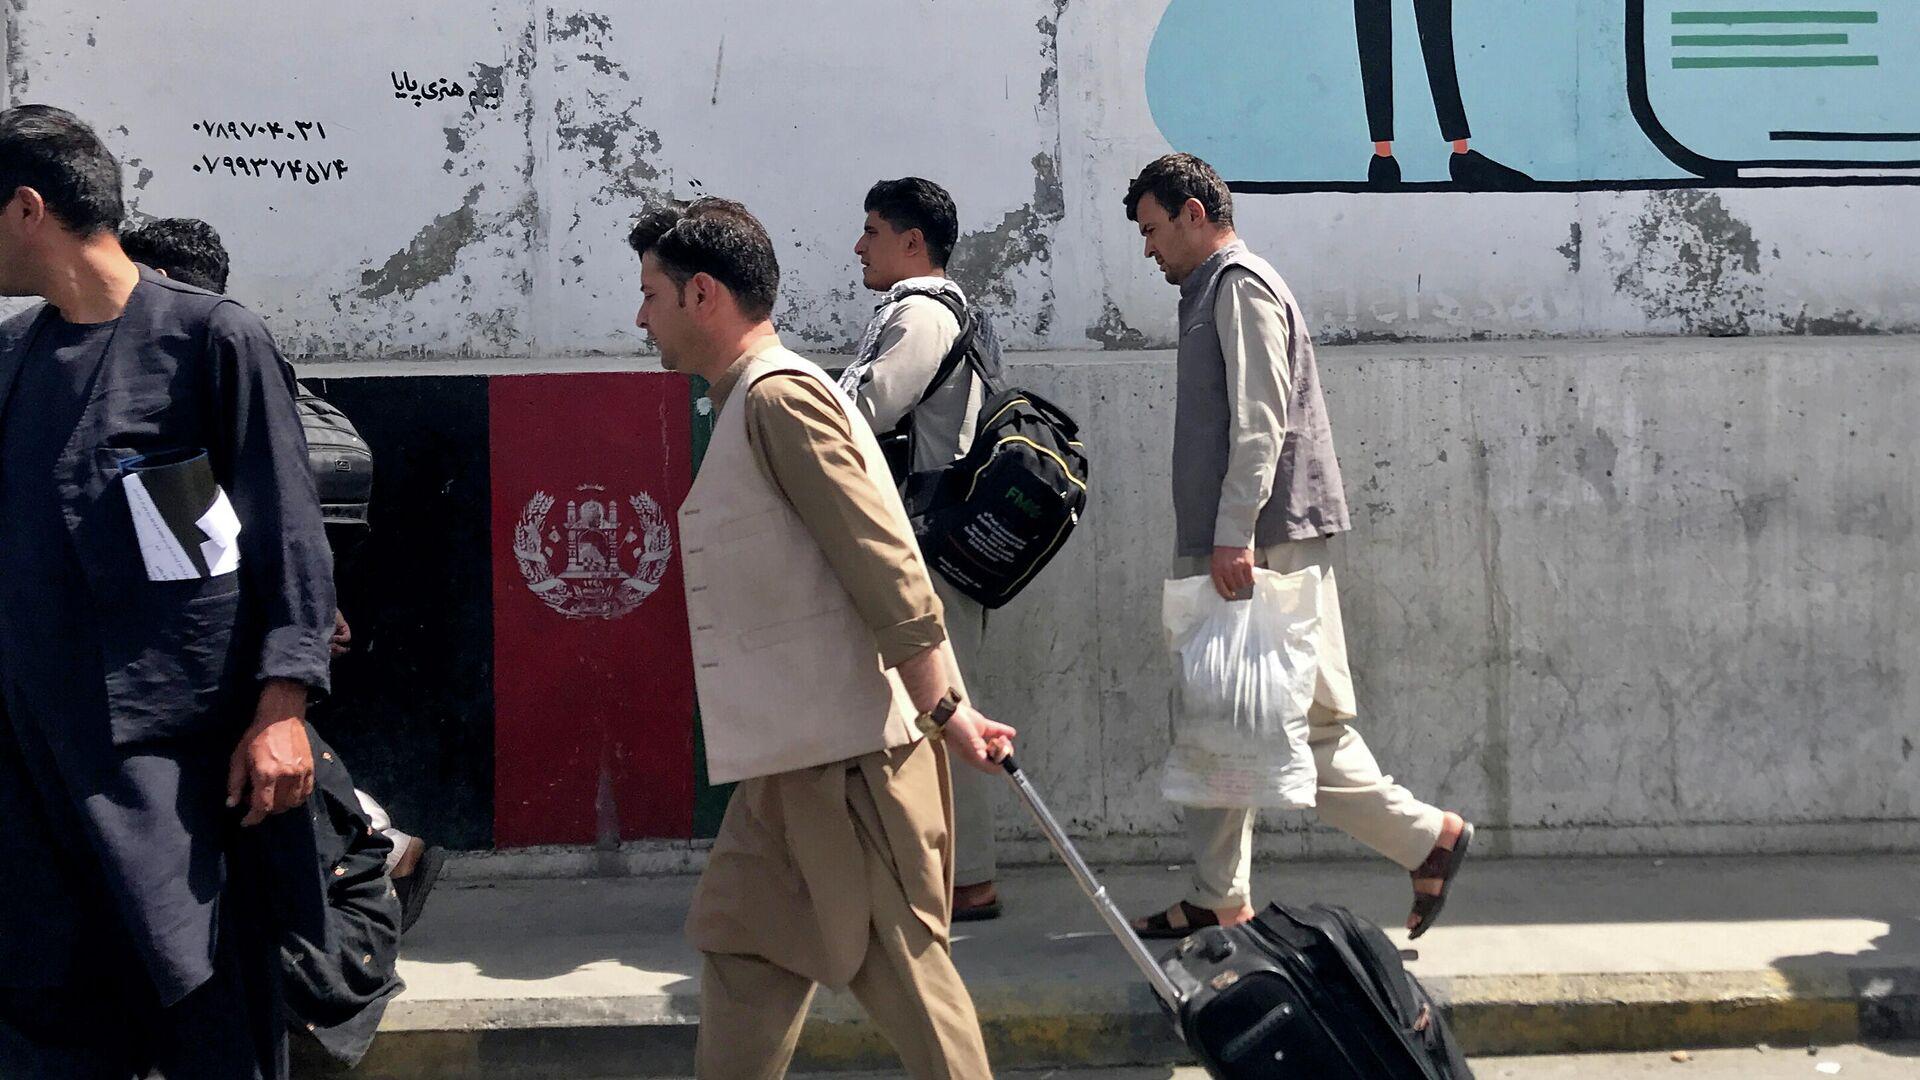 Los pasajeros en el aeropuero de Kabul - Sputnik Mundo, 1920, 24.08.2021